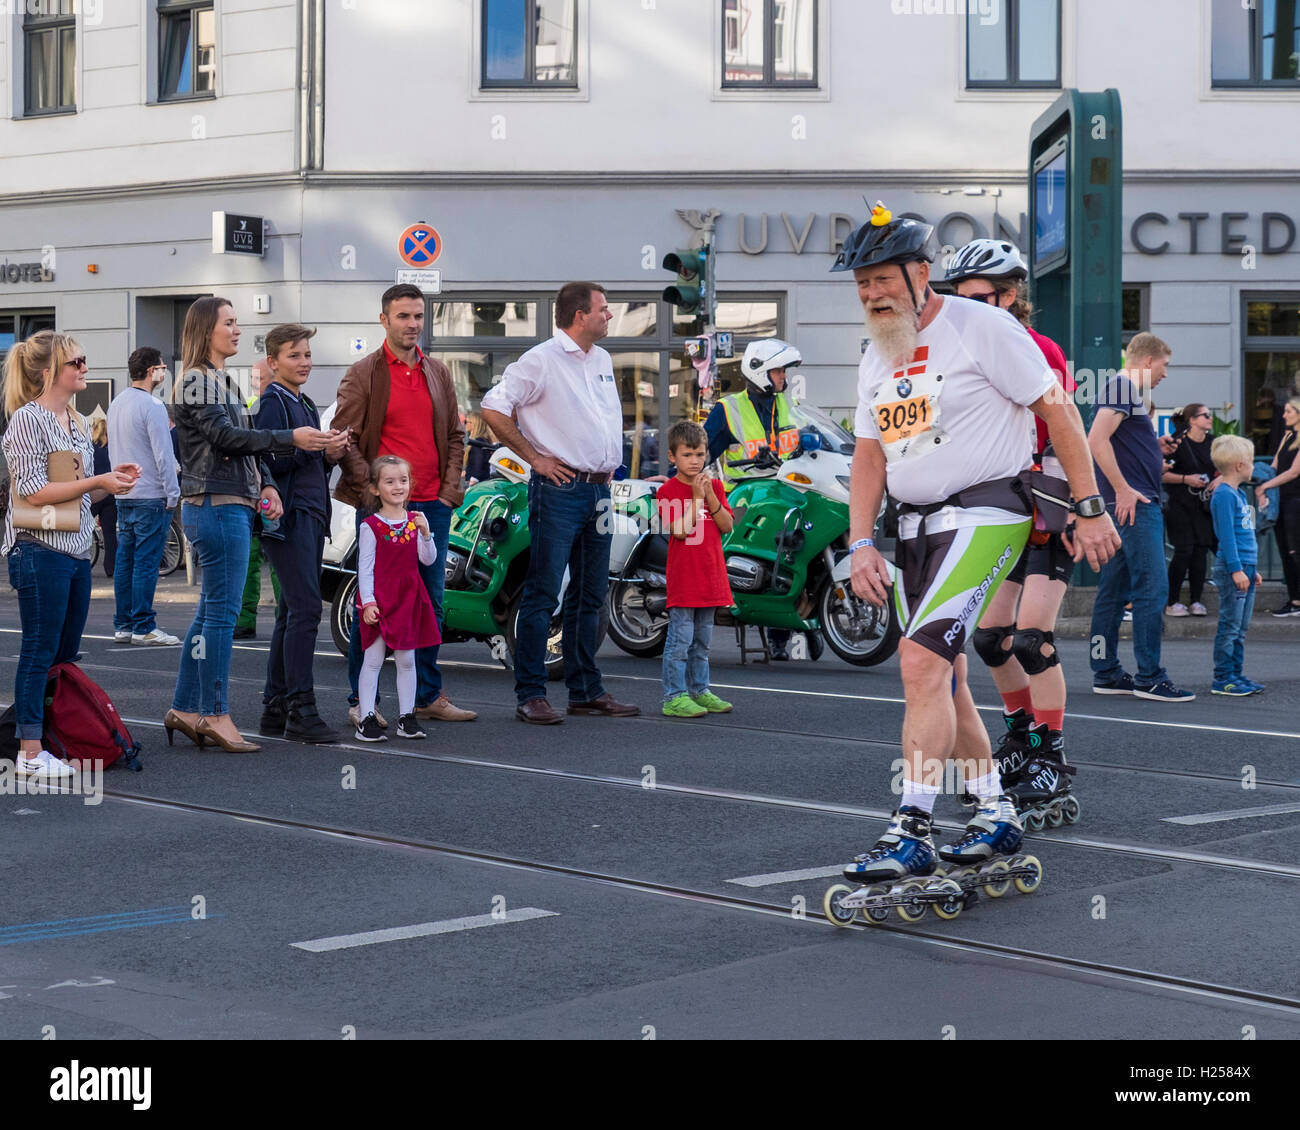 Berlin Germany, 24th September 2016. In-line skaters pass through Rosenthalerplatz during the annual In-line skating marathon Credit:  Eden Breitz/Alamy Live News Stock Photo